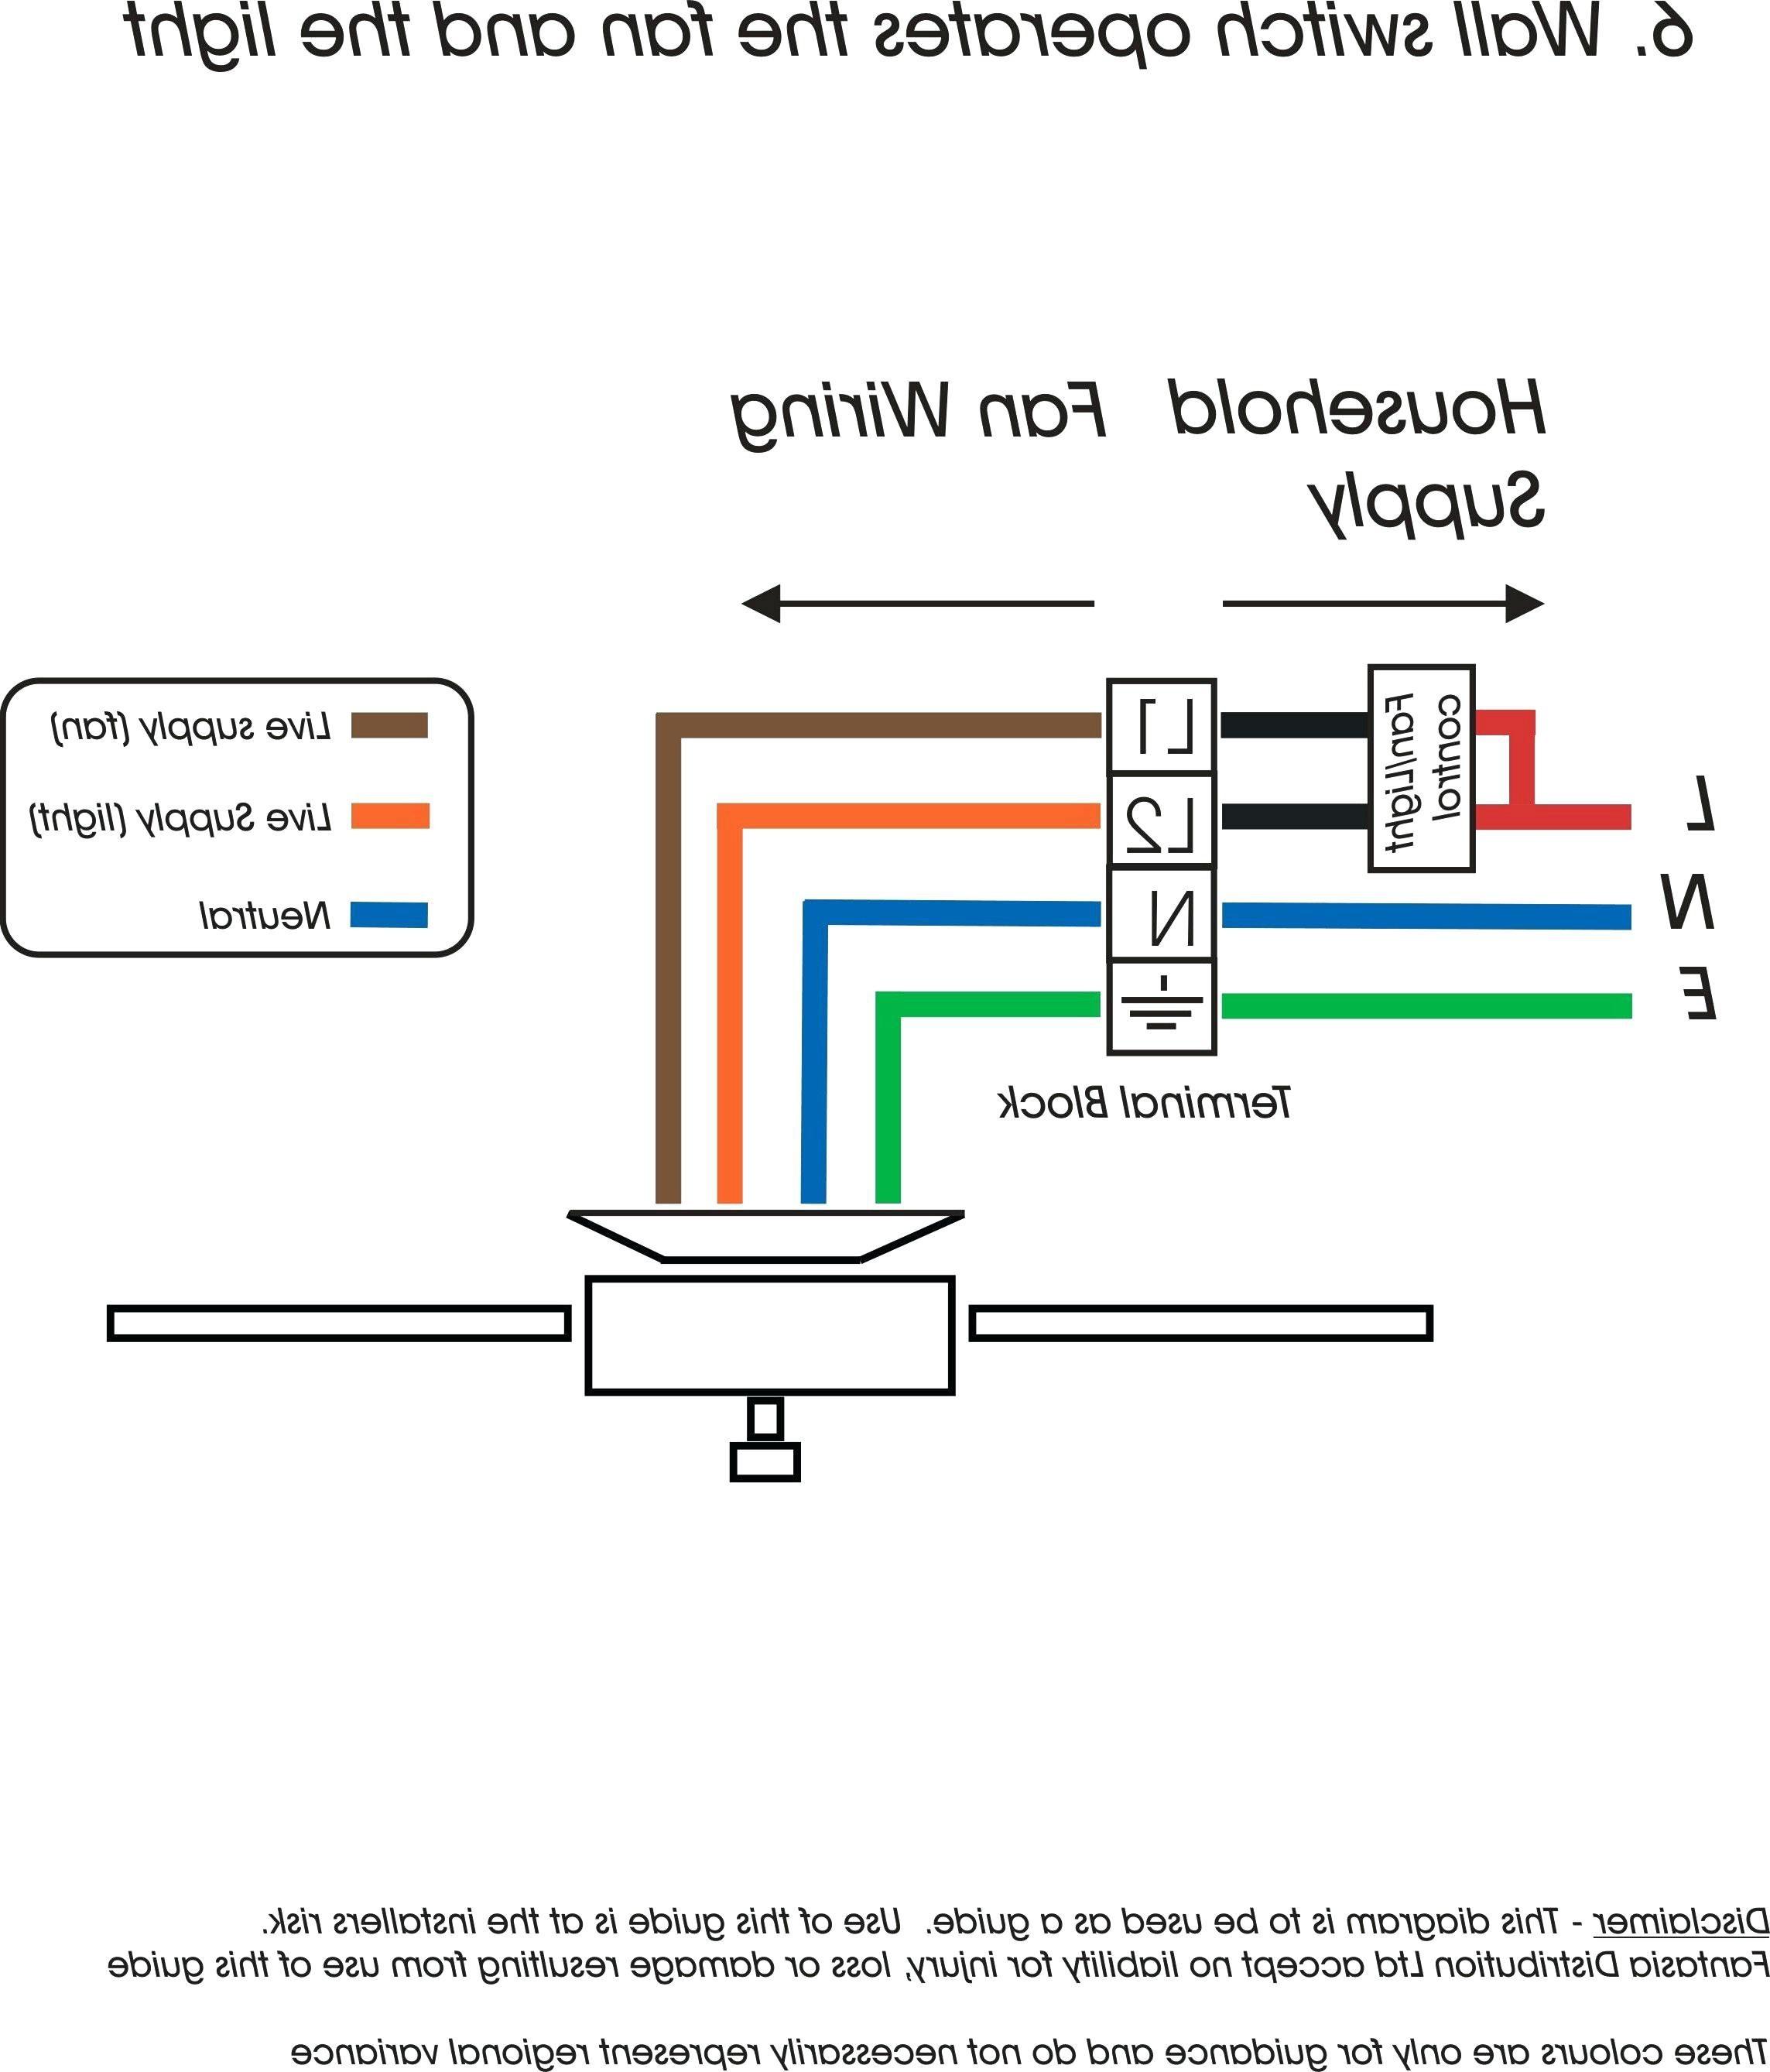 Led Light Wiring Diagram Elegant Wiring Diagram for Bathroom Fan and Light Panasonic